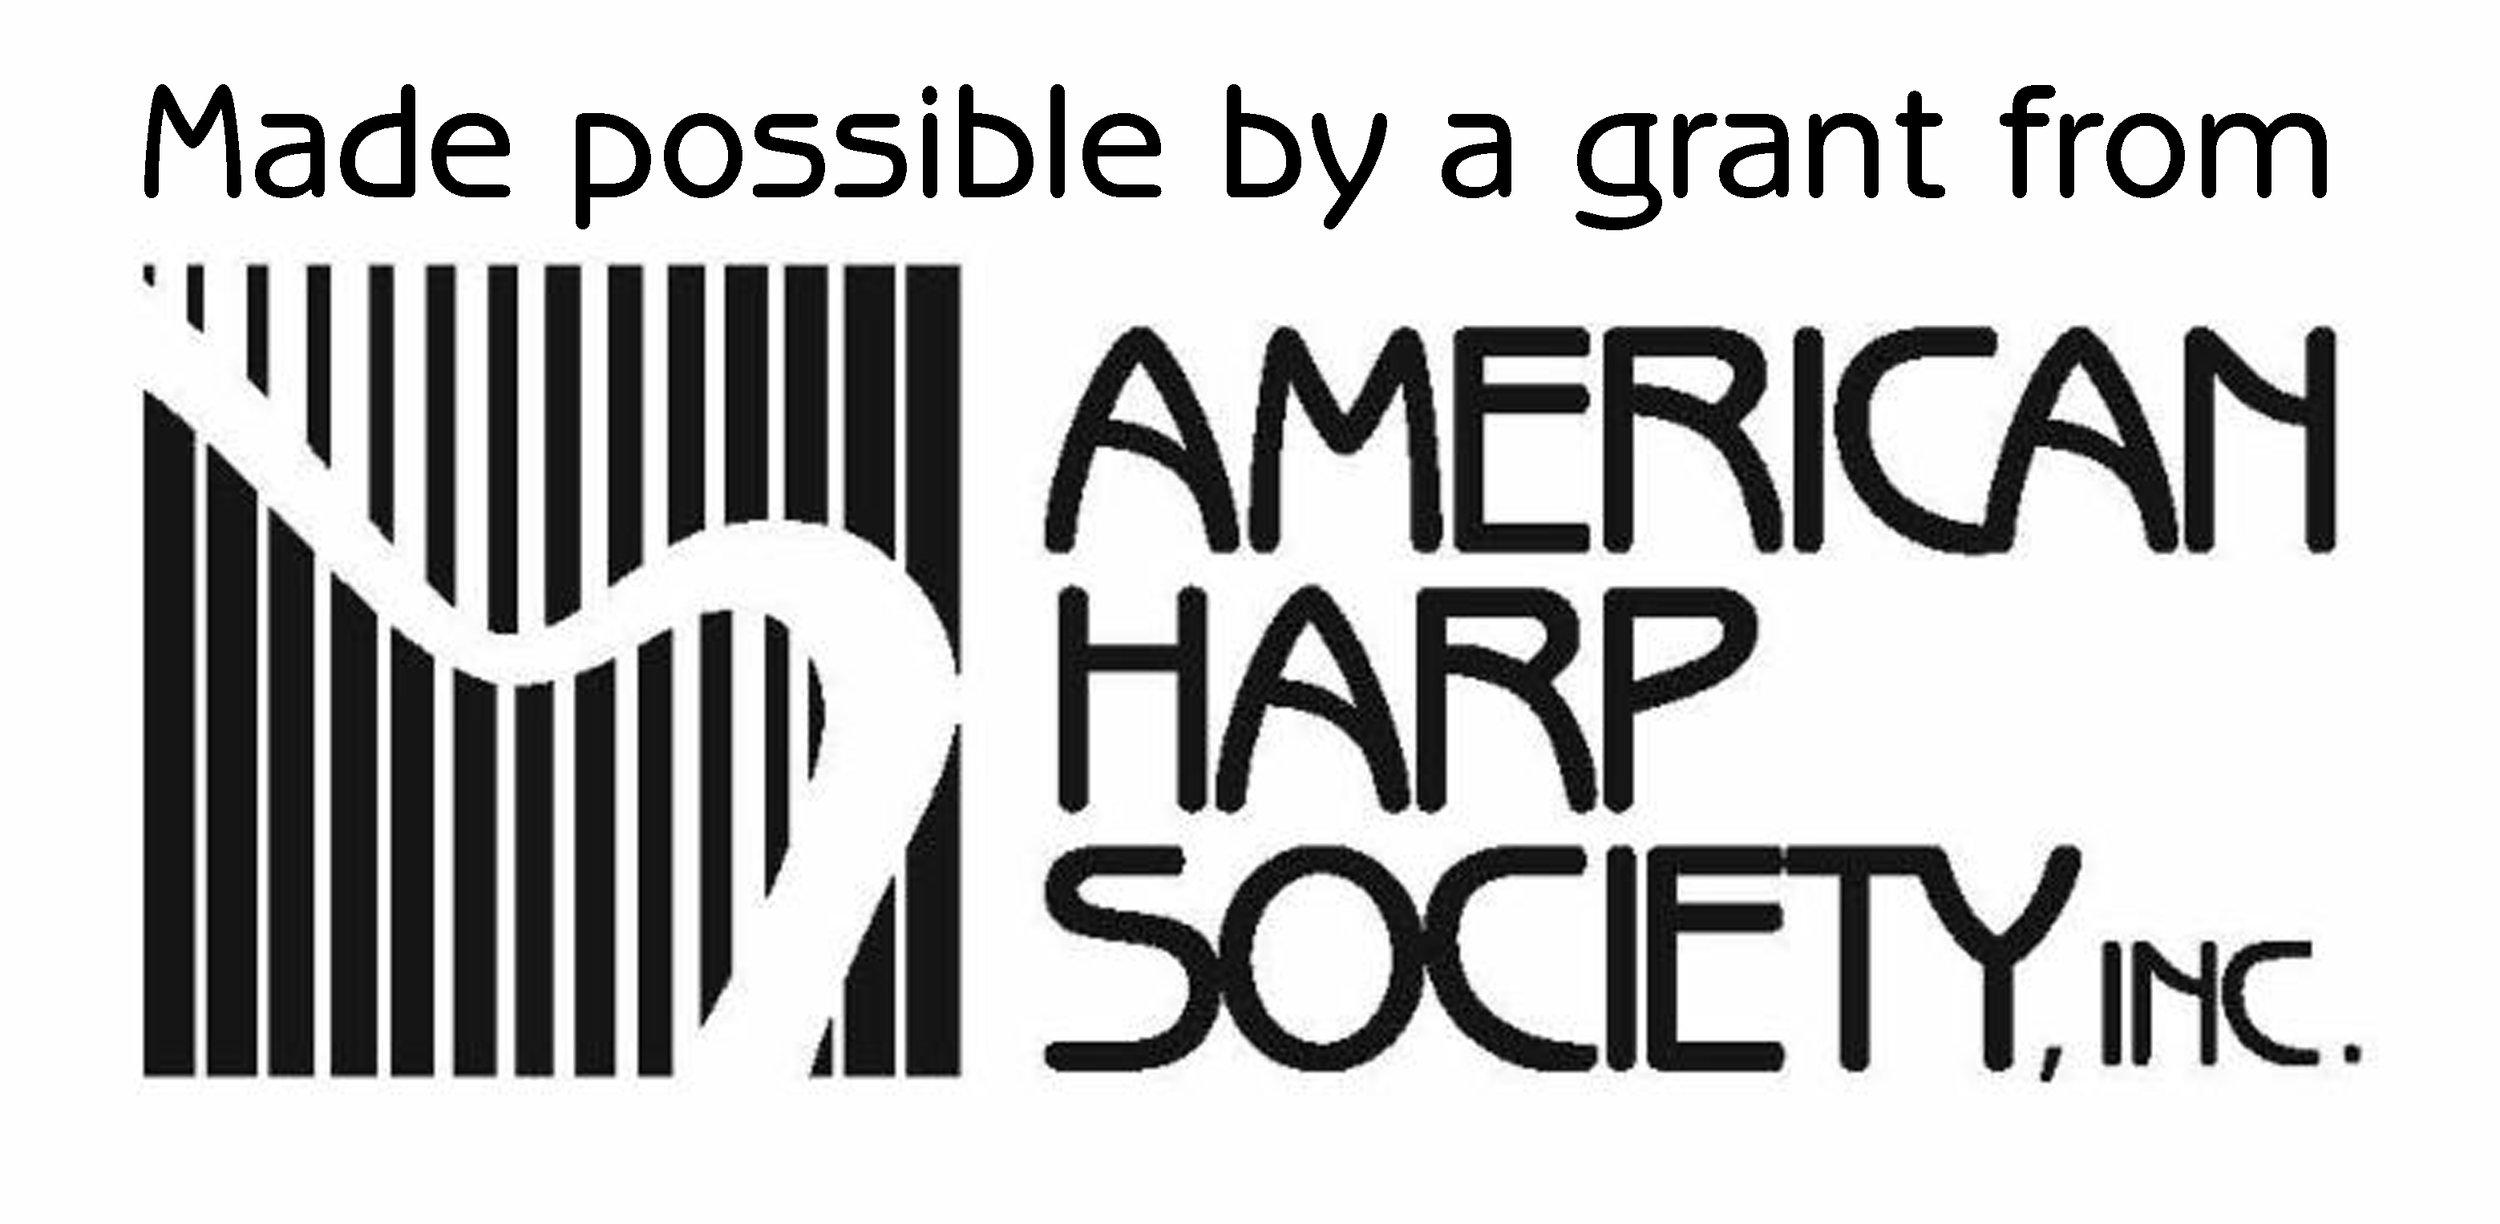 american harp society.jpeg